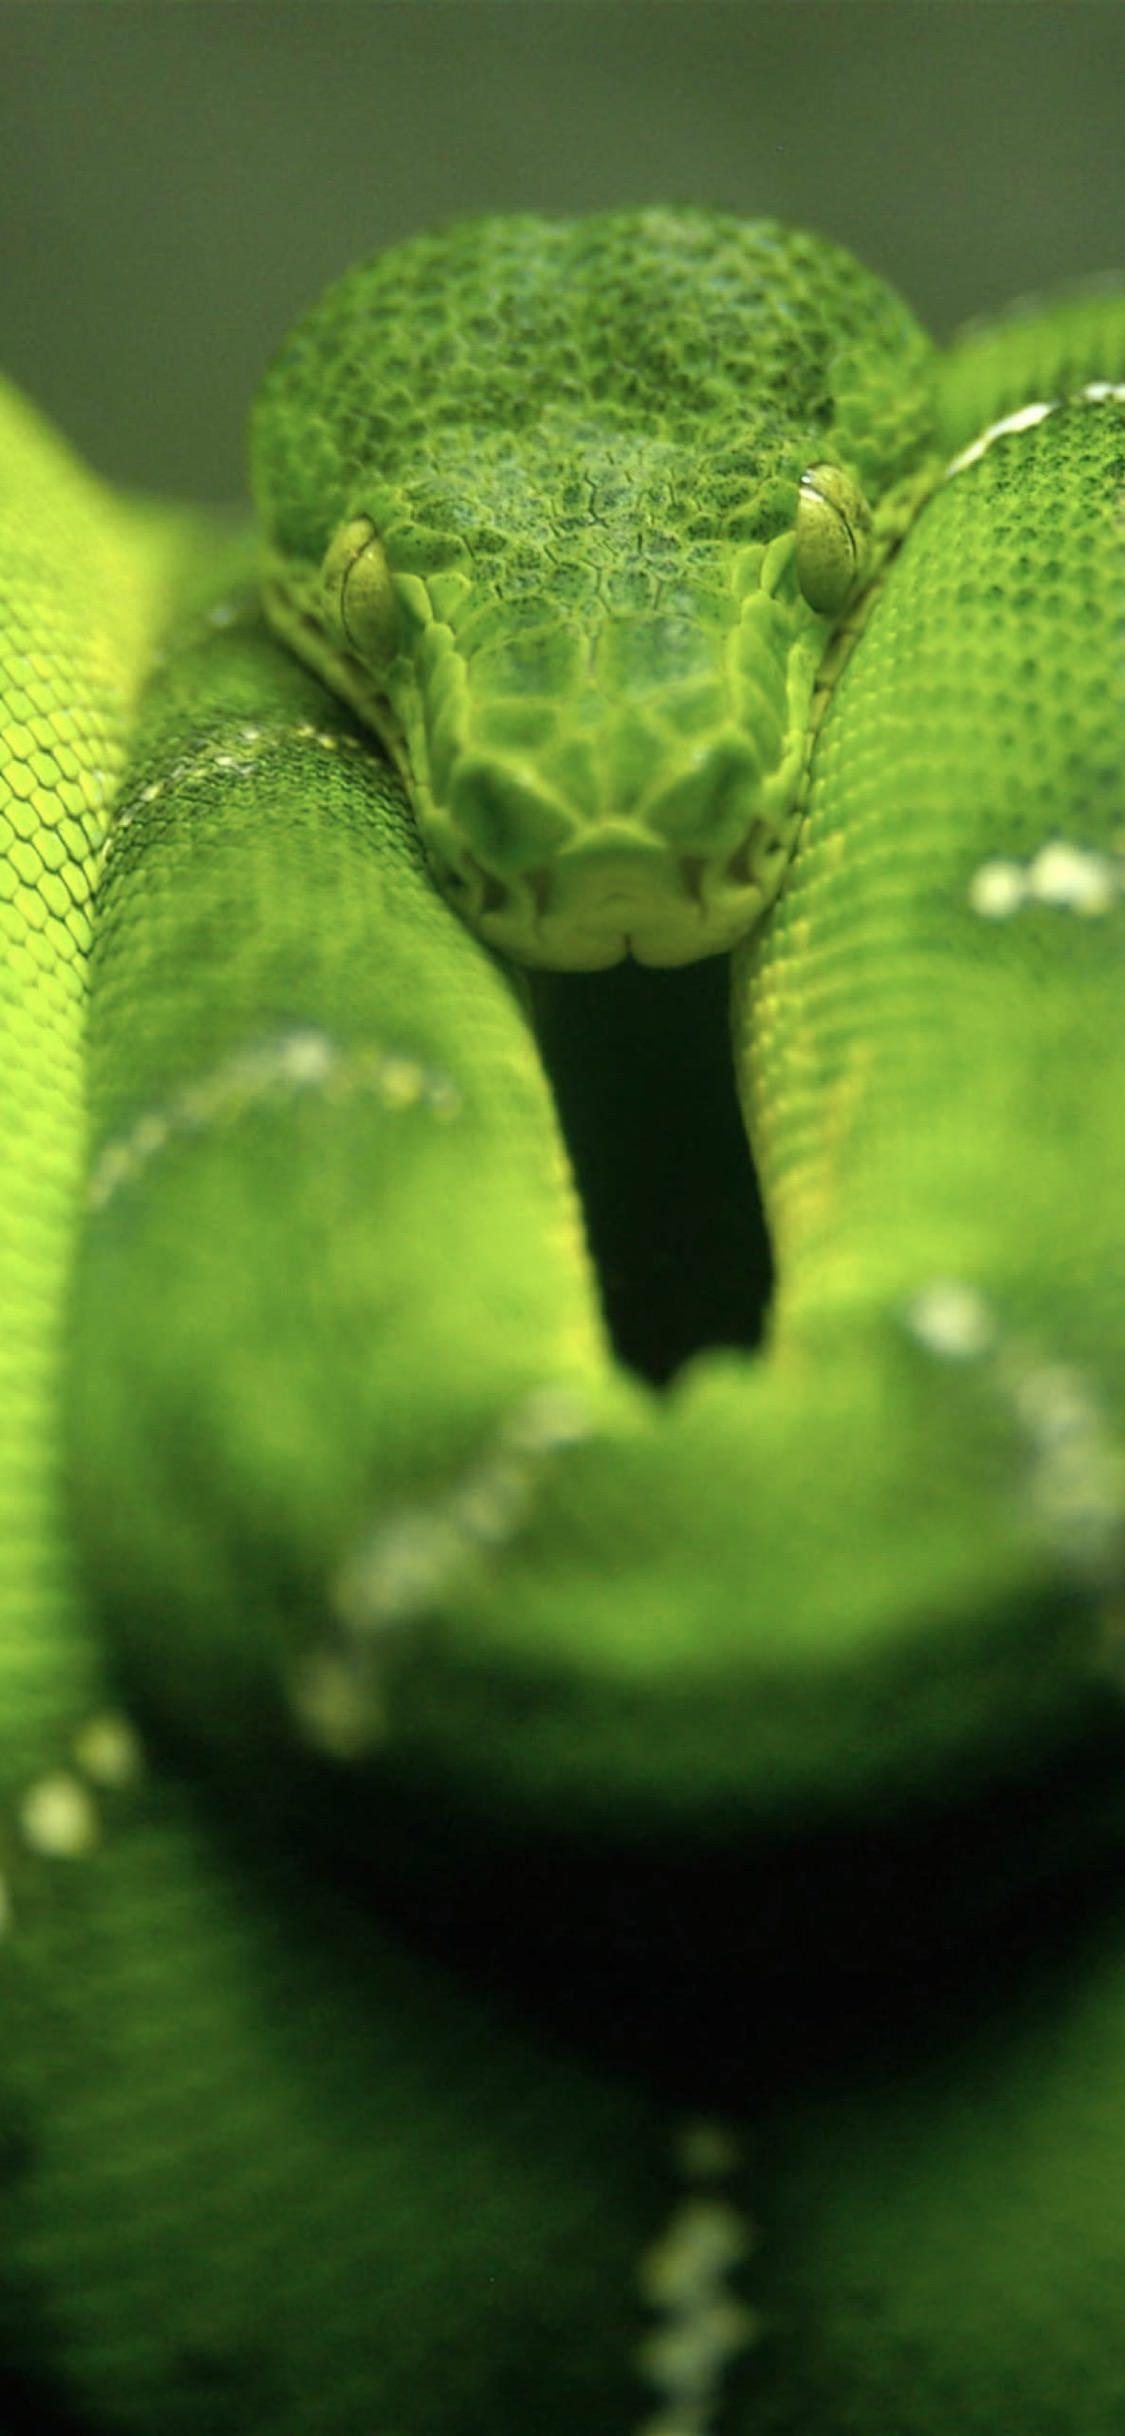 Snake Wallpaper Iphone X Kadada Org